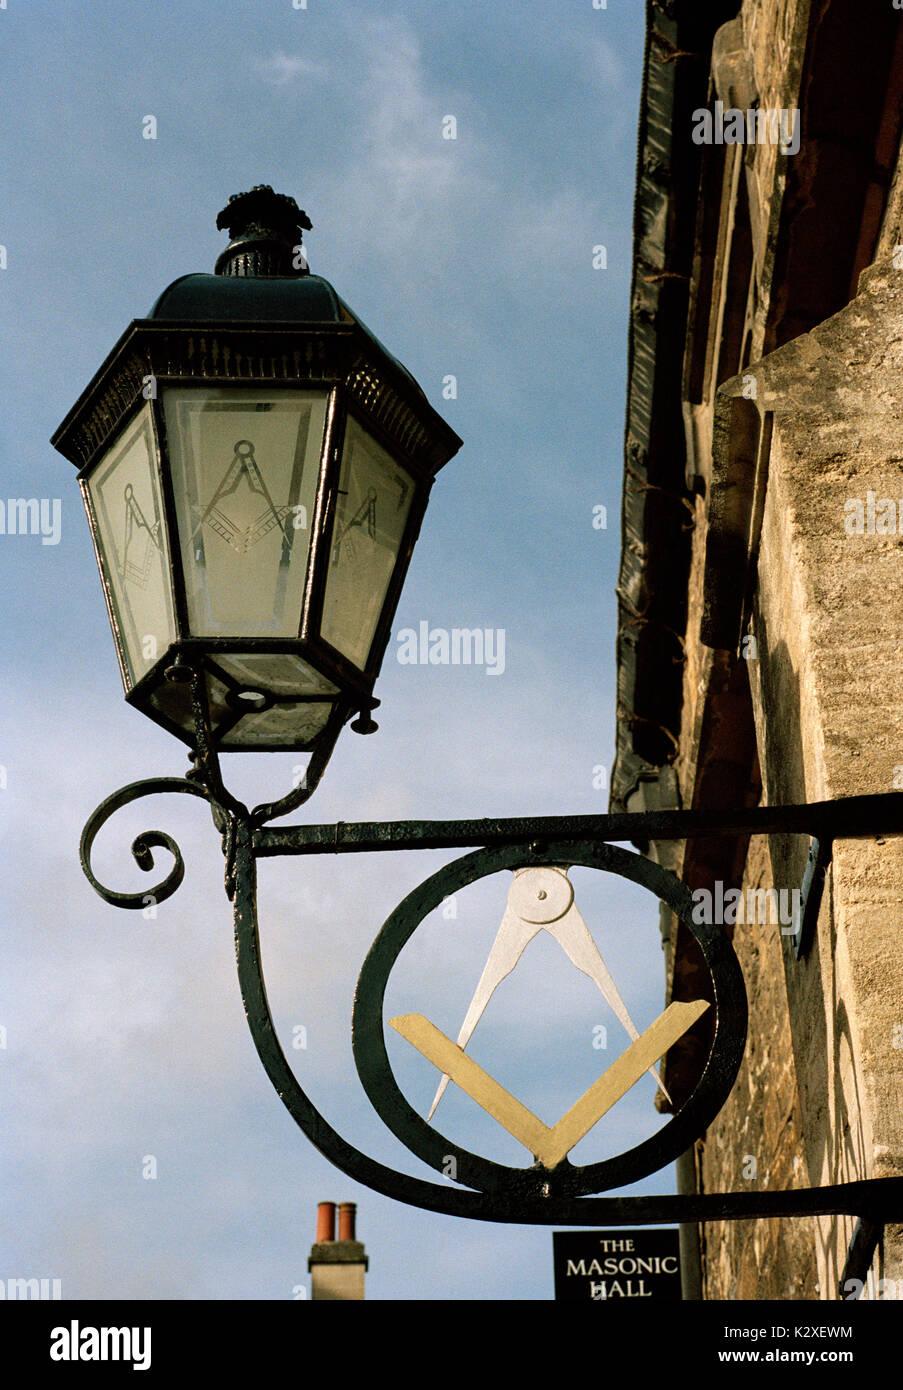 Masonic Hall symbol Bradford On Avon in Wiltshire in England in Great Britain in United Kingdom UK Europe. Freemason Freemasonry Symbolism Religion - Stock Image